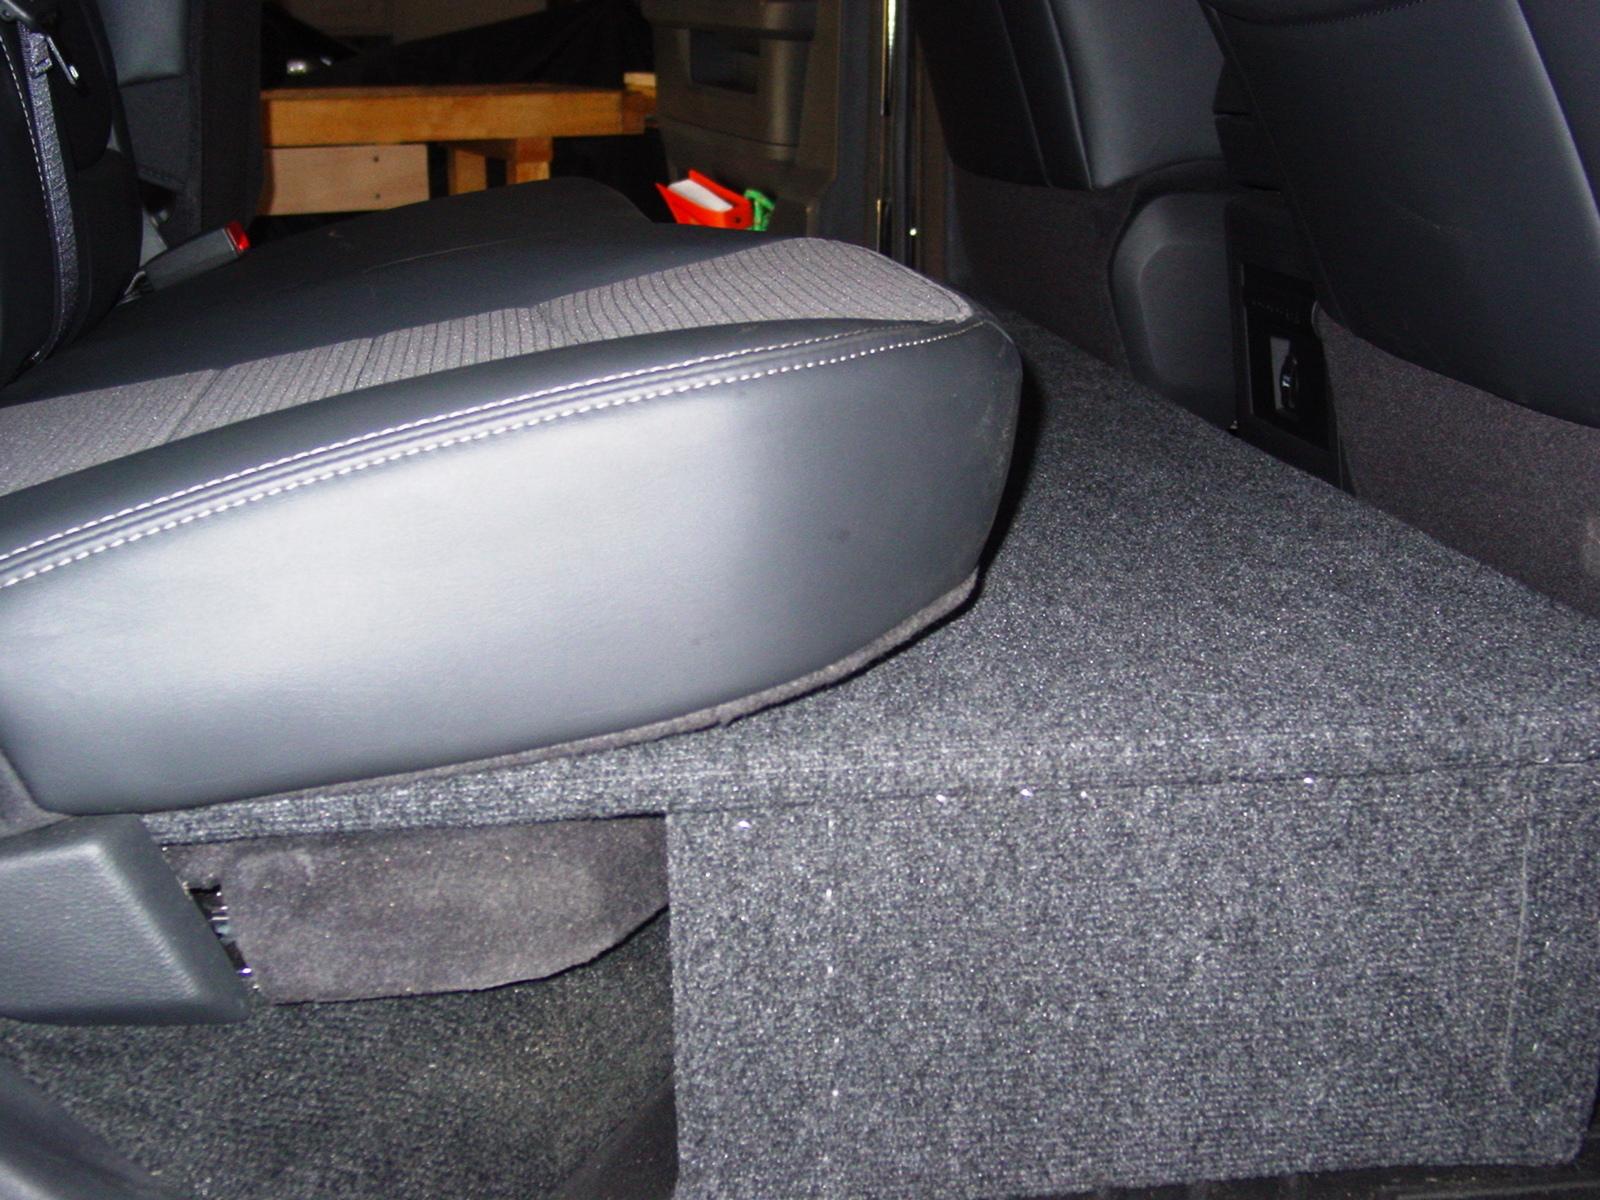 2000-2016 Chevy Impala//Monte Carlo Control Arm Kit Compatible with 1997-2009 Buick Century//Regal//Allure//LaCrosse 2004-2008 Pontiac Grand Prix 1998-2002 Oldsmobile Intrigue